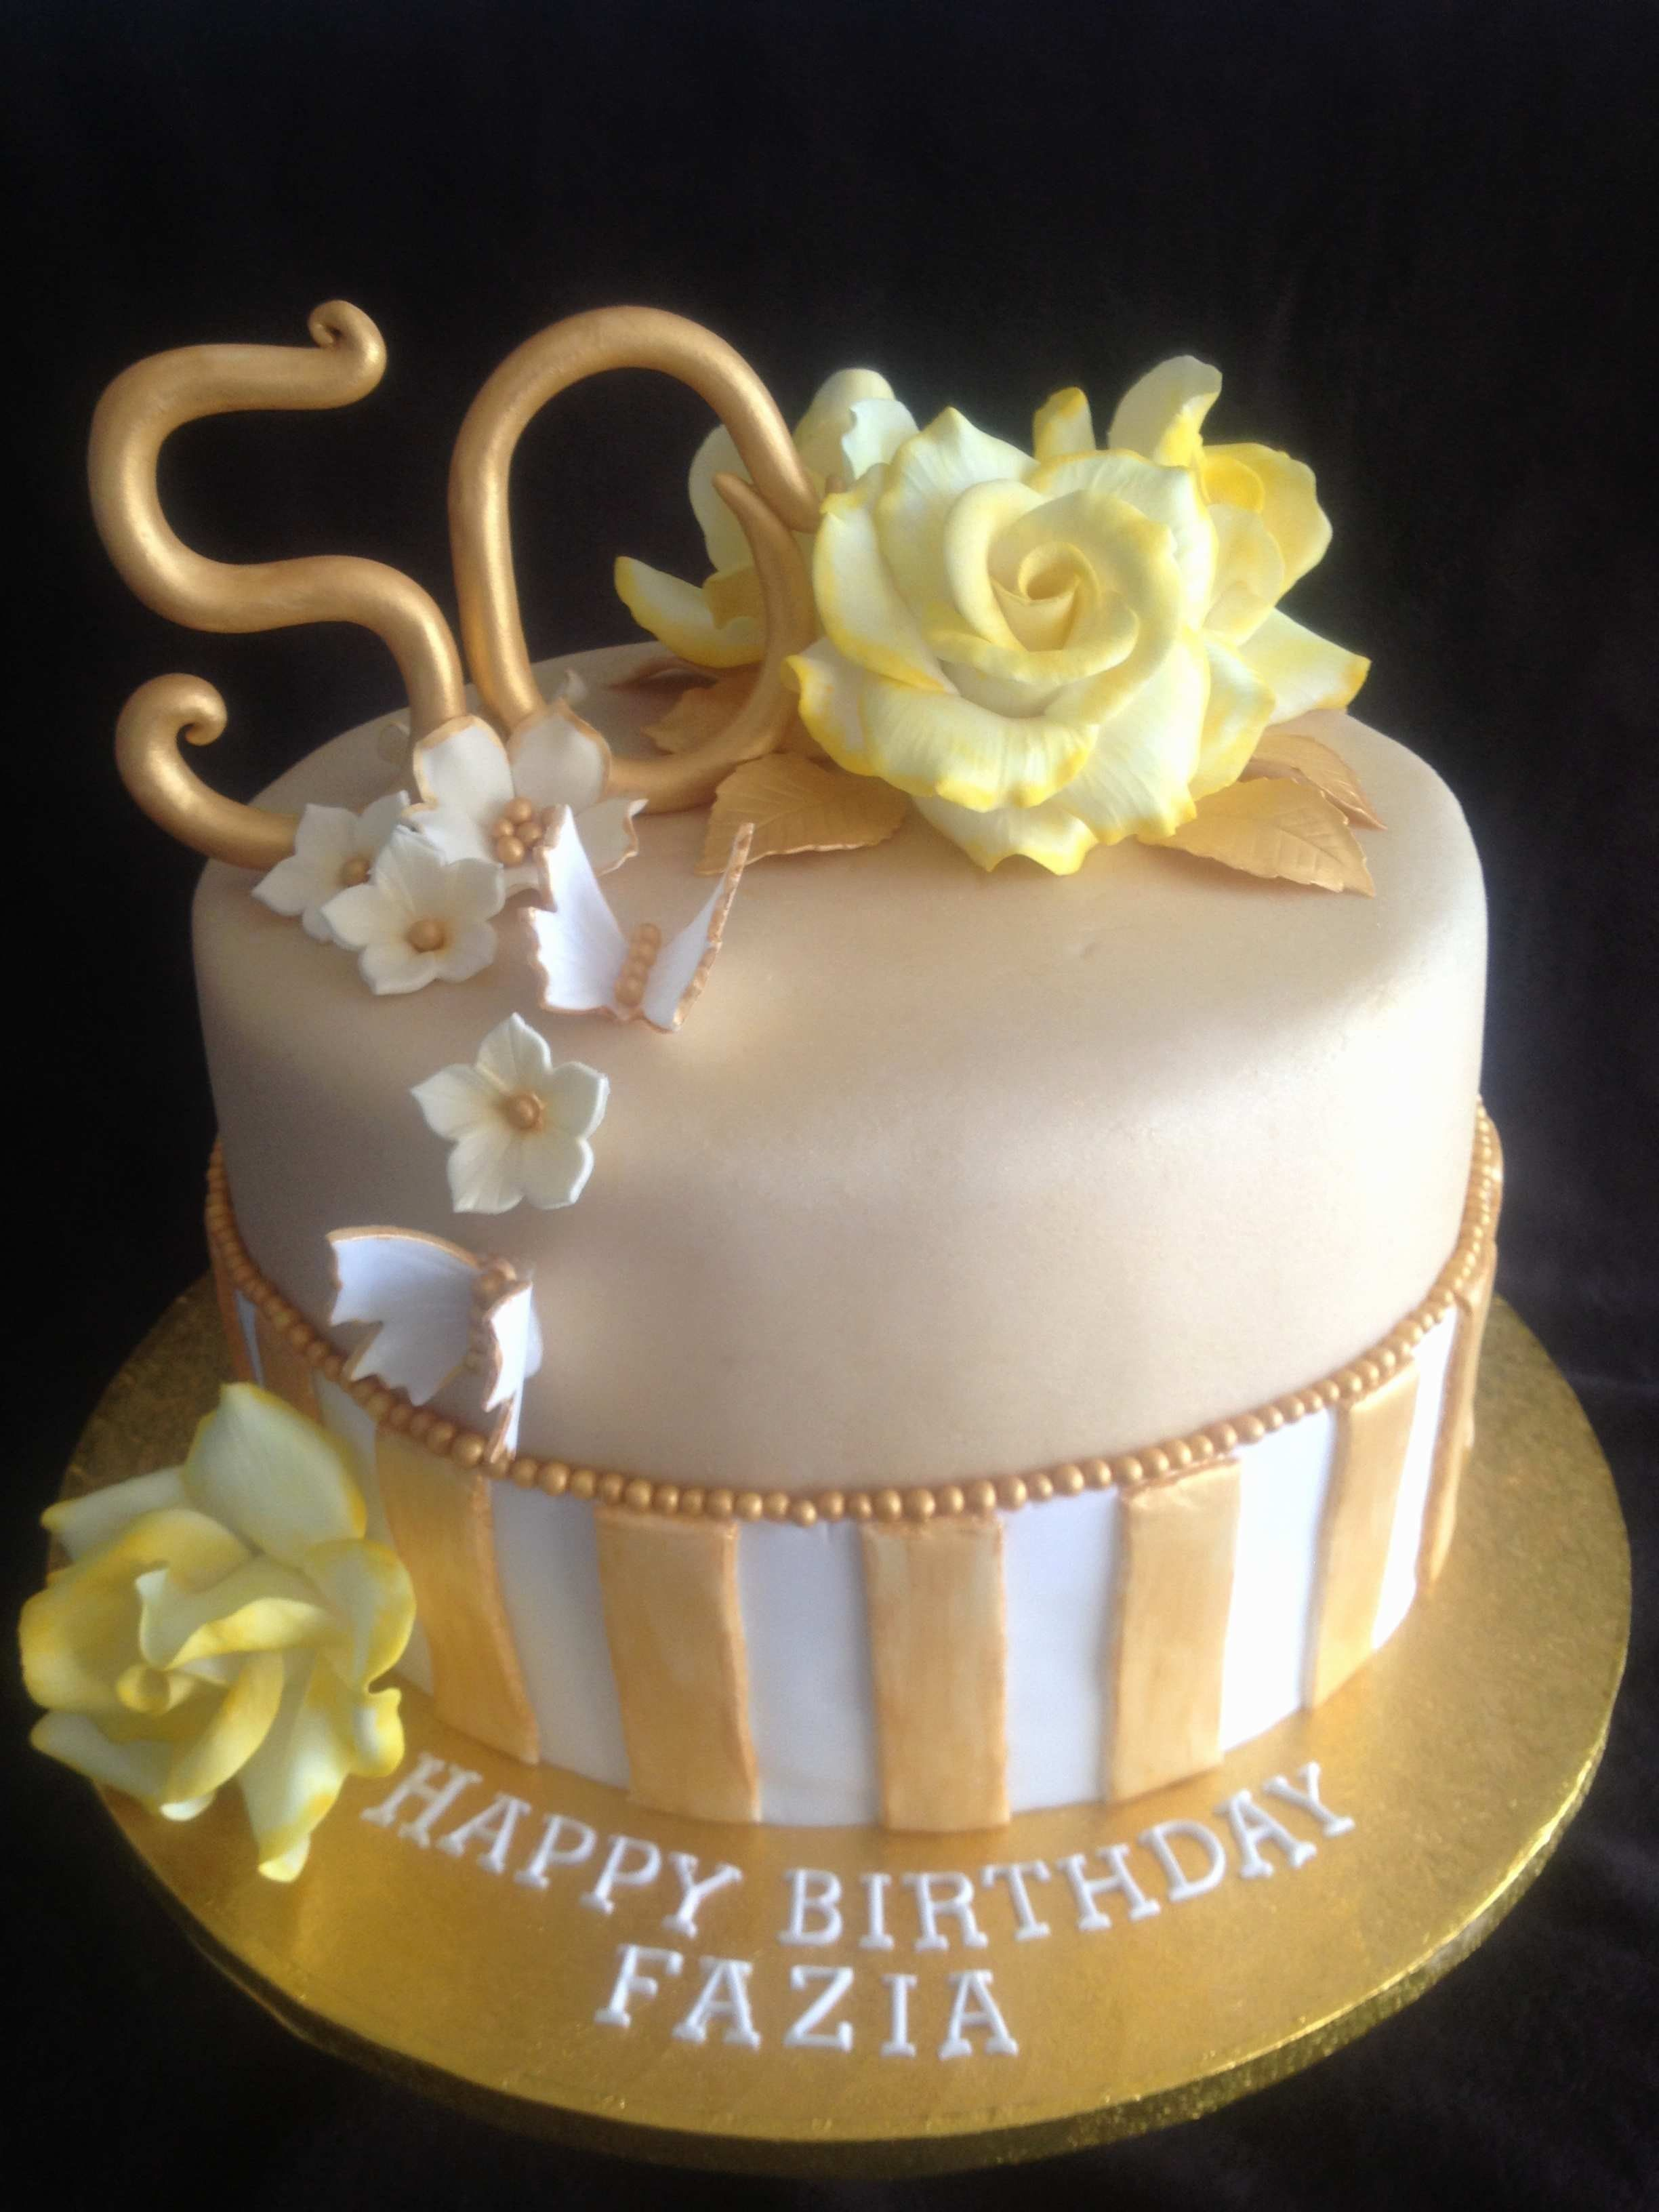 Tremendous Birthday Cakes With Names Happy Birthday Cake Name Image Beautiful Funny Birthday Cards Online Drosicarndamsfinfo